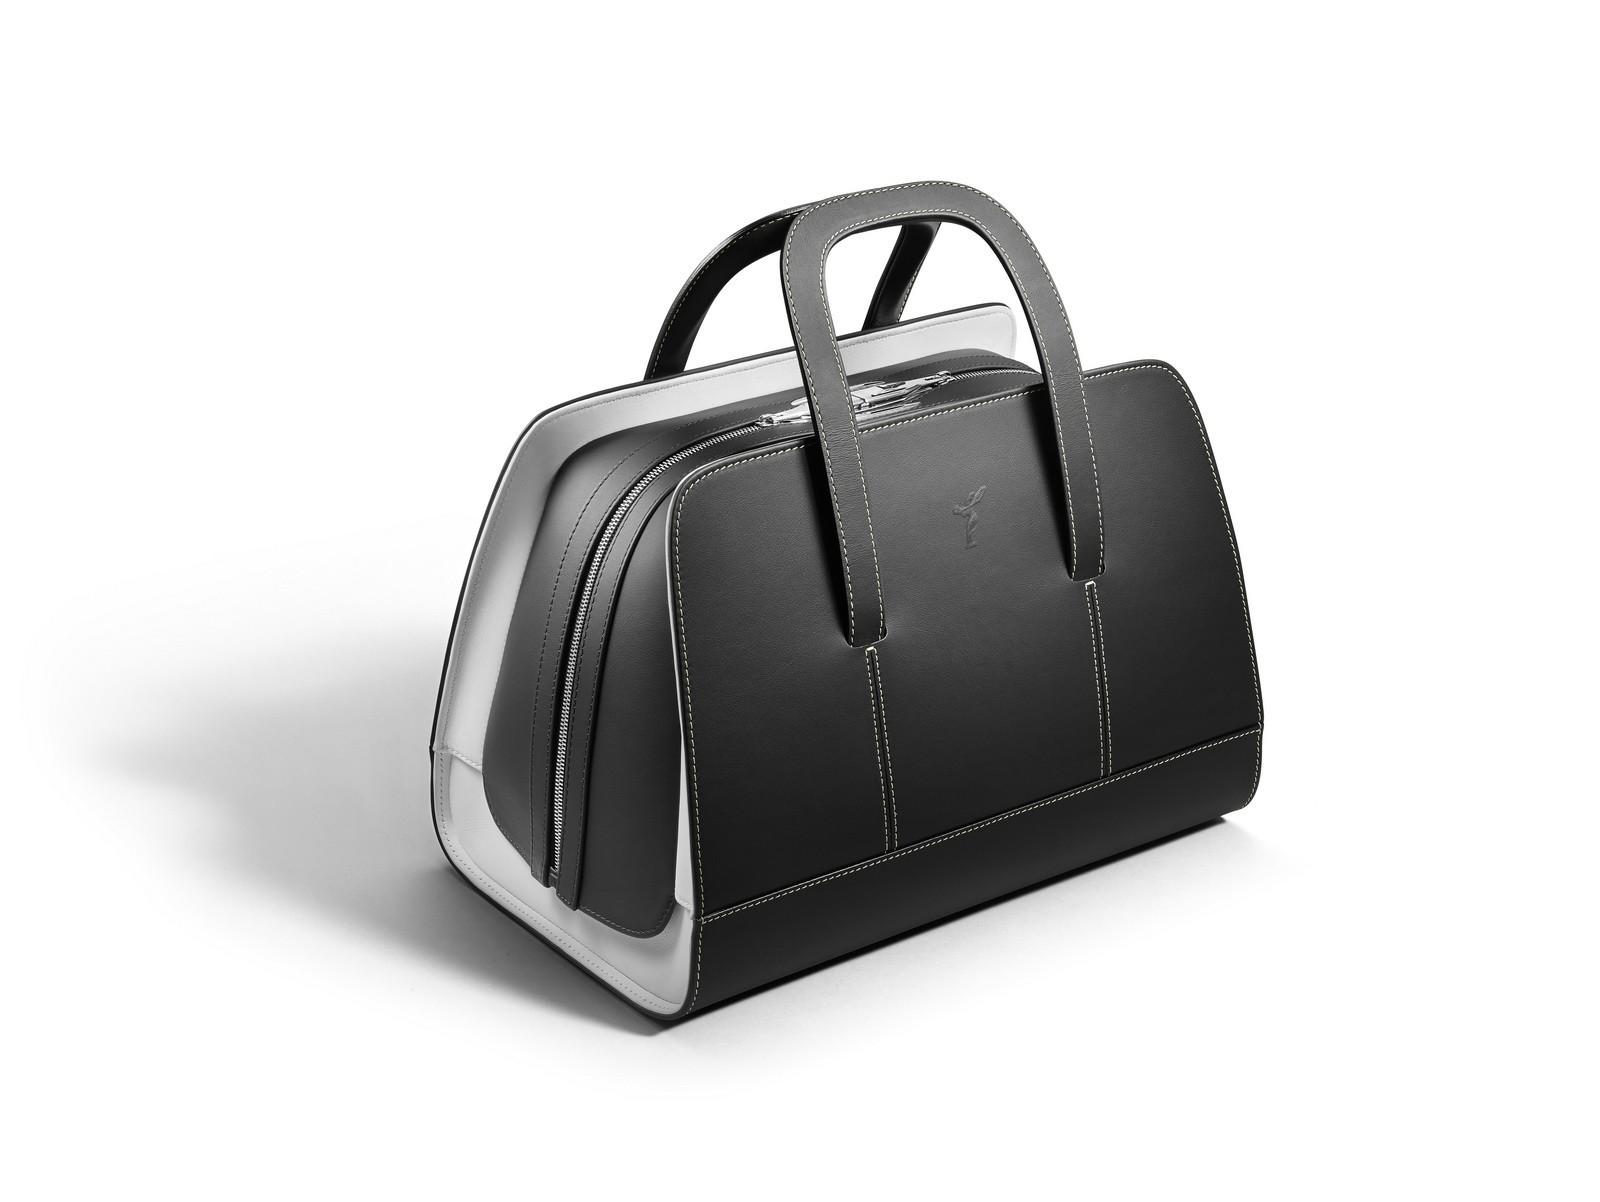 Foto de Rolls-Royce - Set de maletas (3/9)